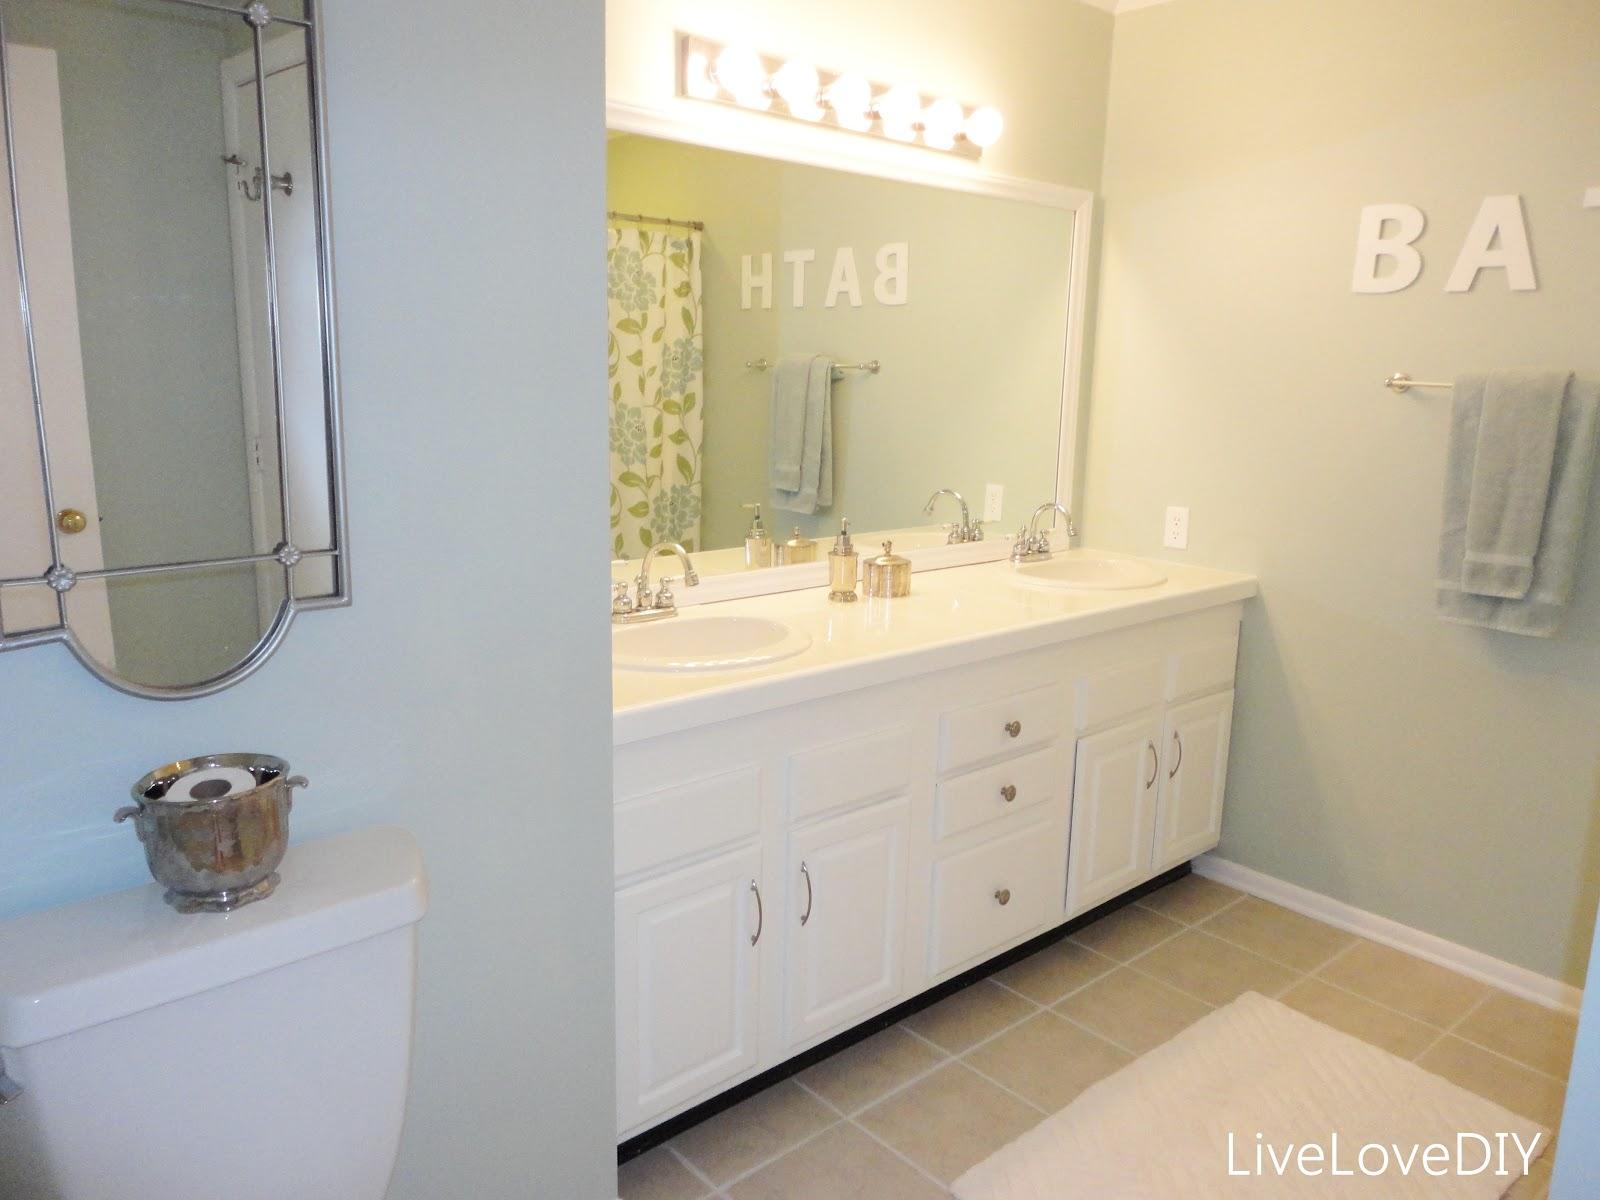 LiveLoveDIY Easy DIY Ideas for Updating Your Bathroom